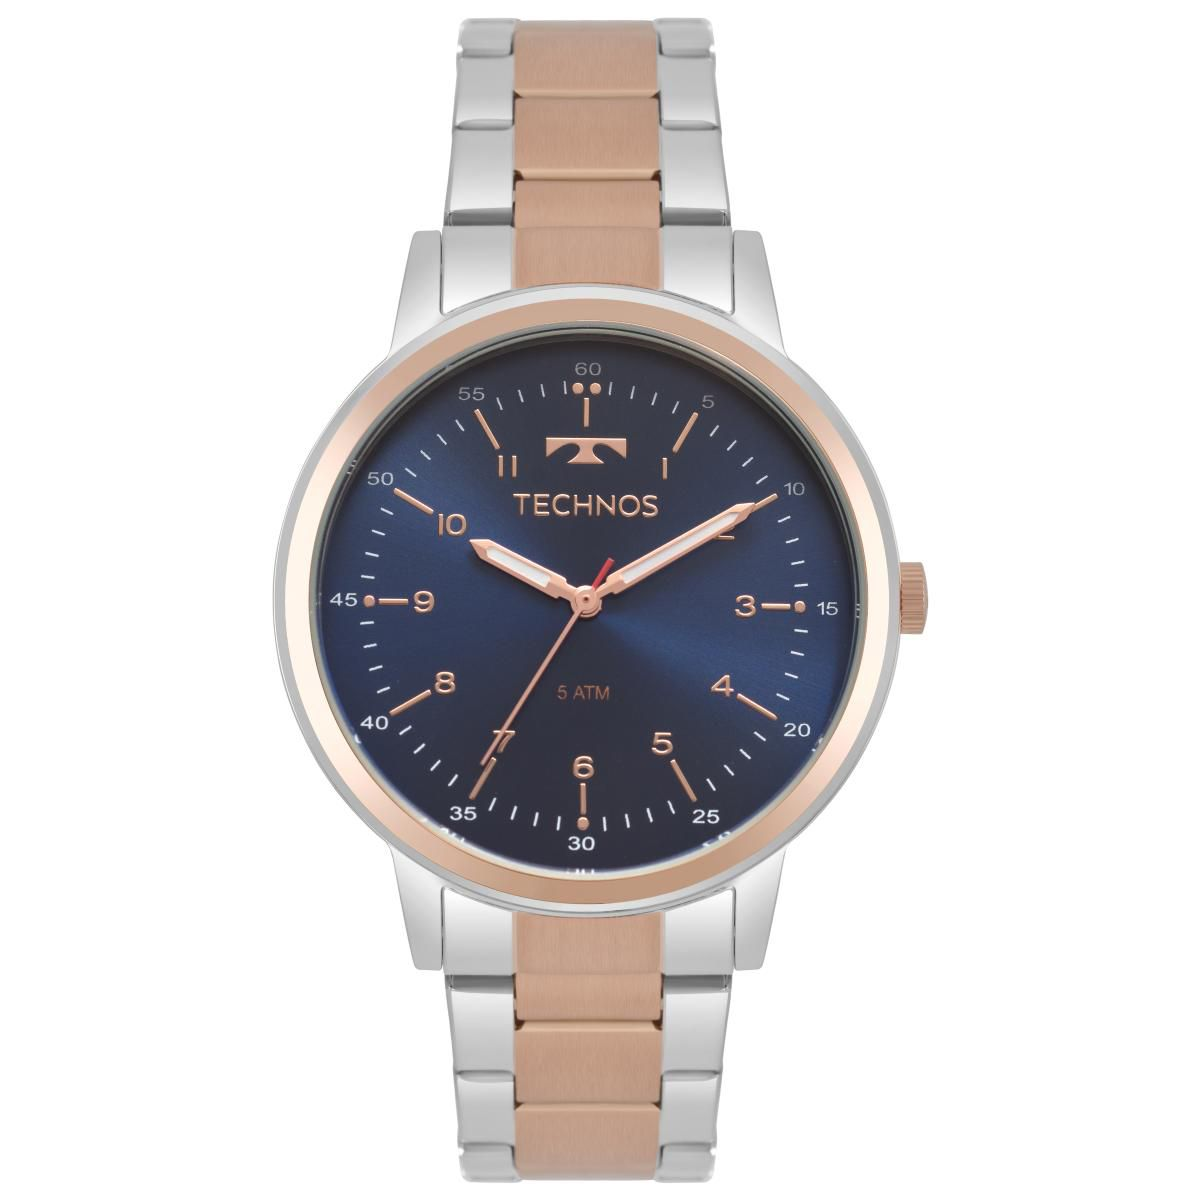 7339895f571 Relógio Feminino Technos Dress 2035MPQ 5A 39mm Aço Bicolor Prata Rosê